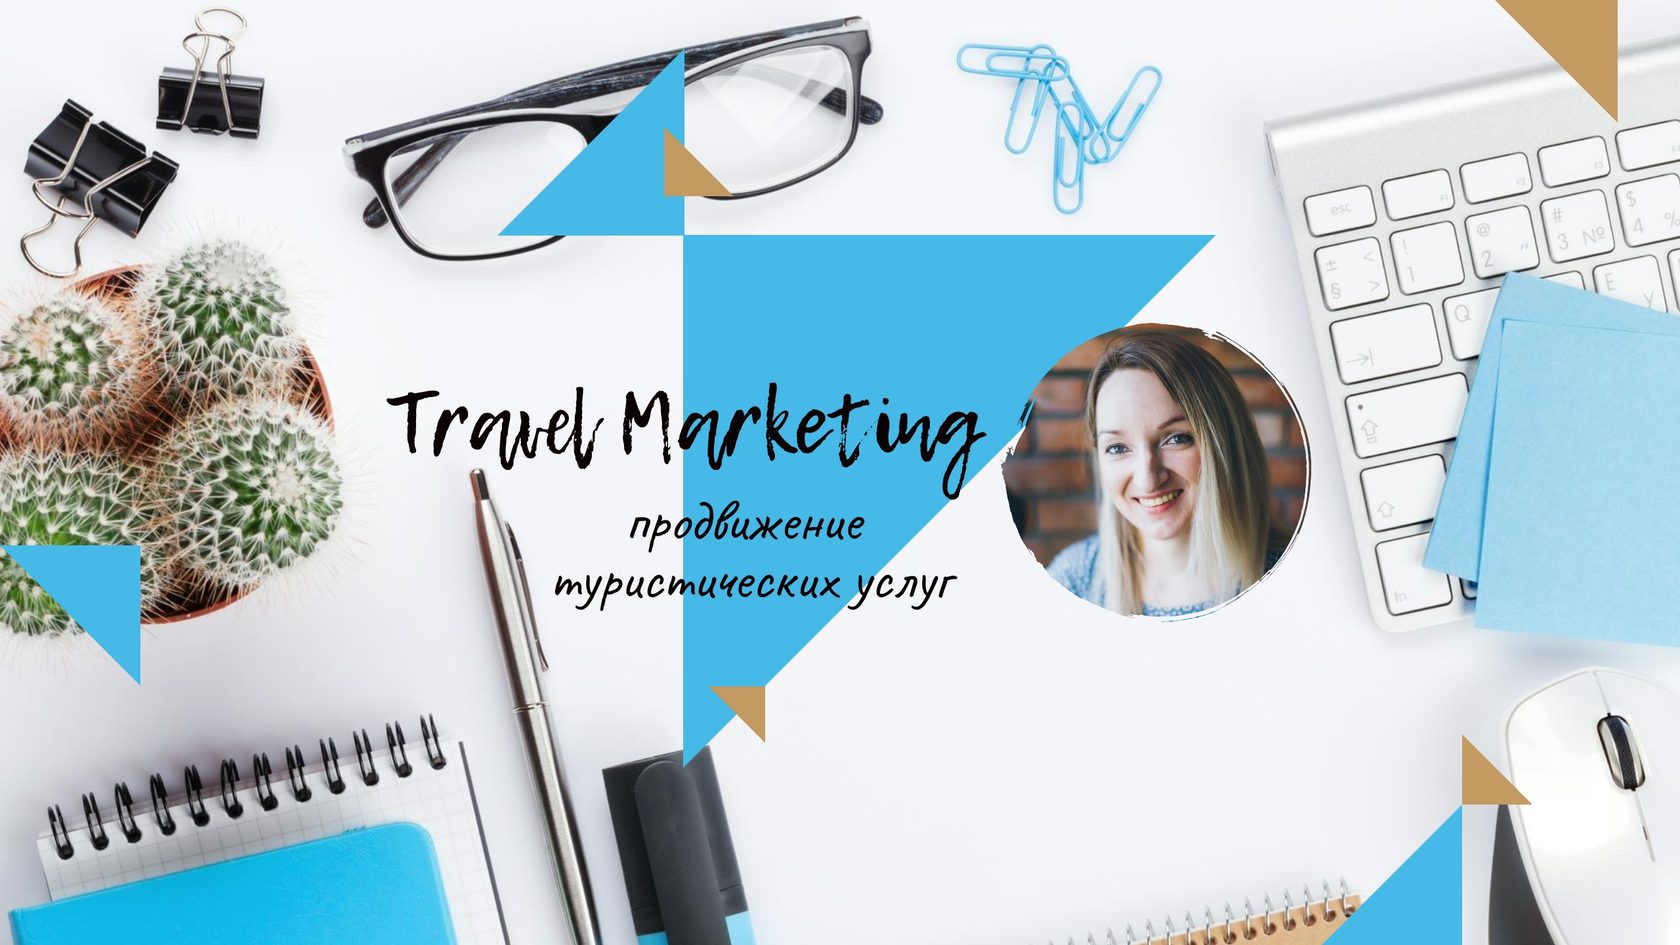 (c) Travel-marketing.ru